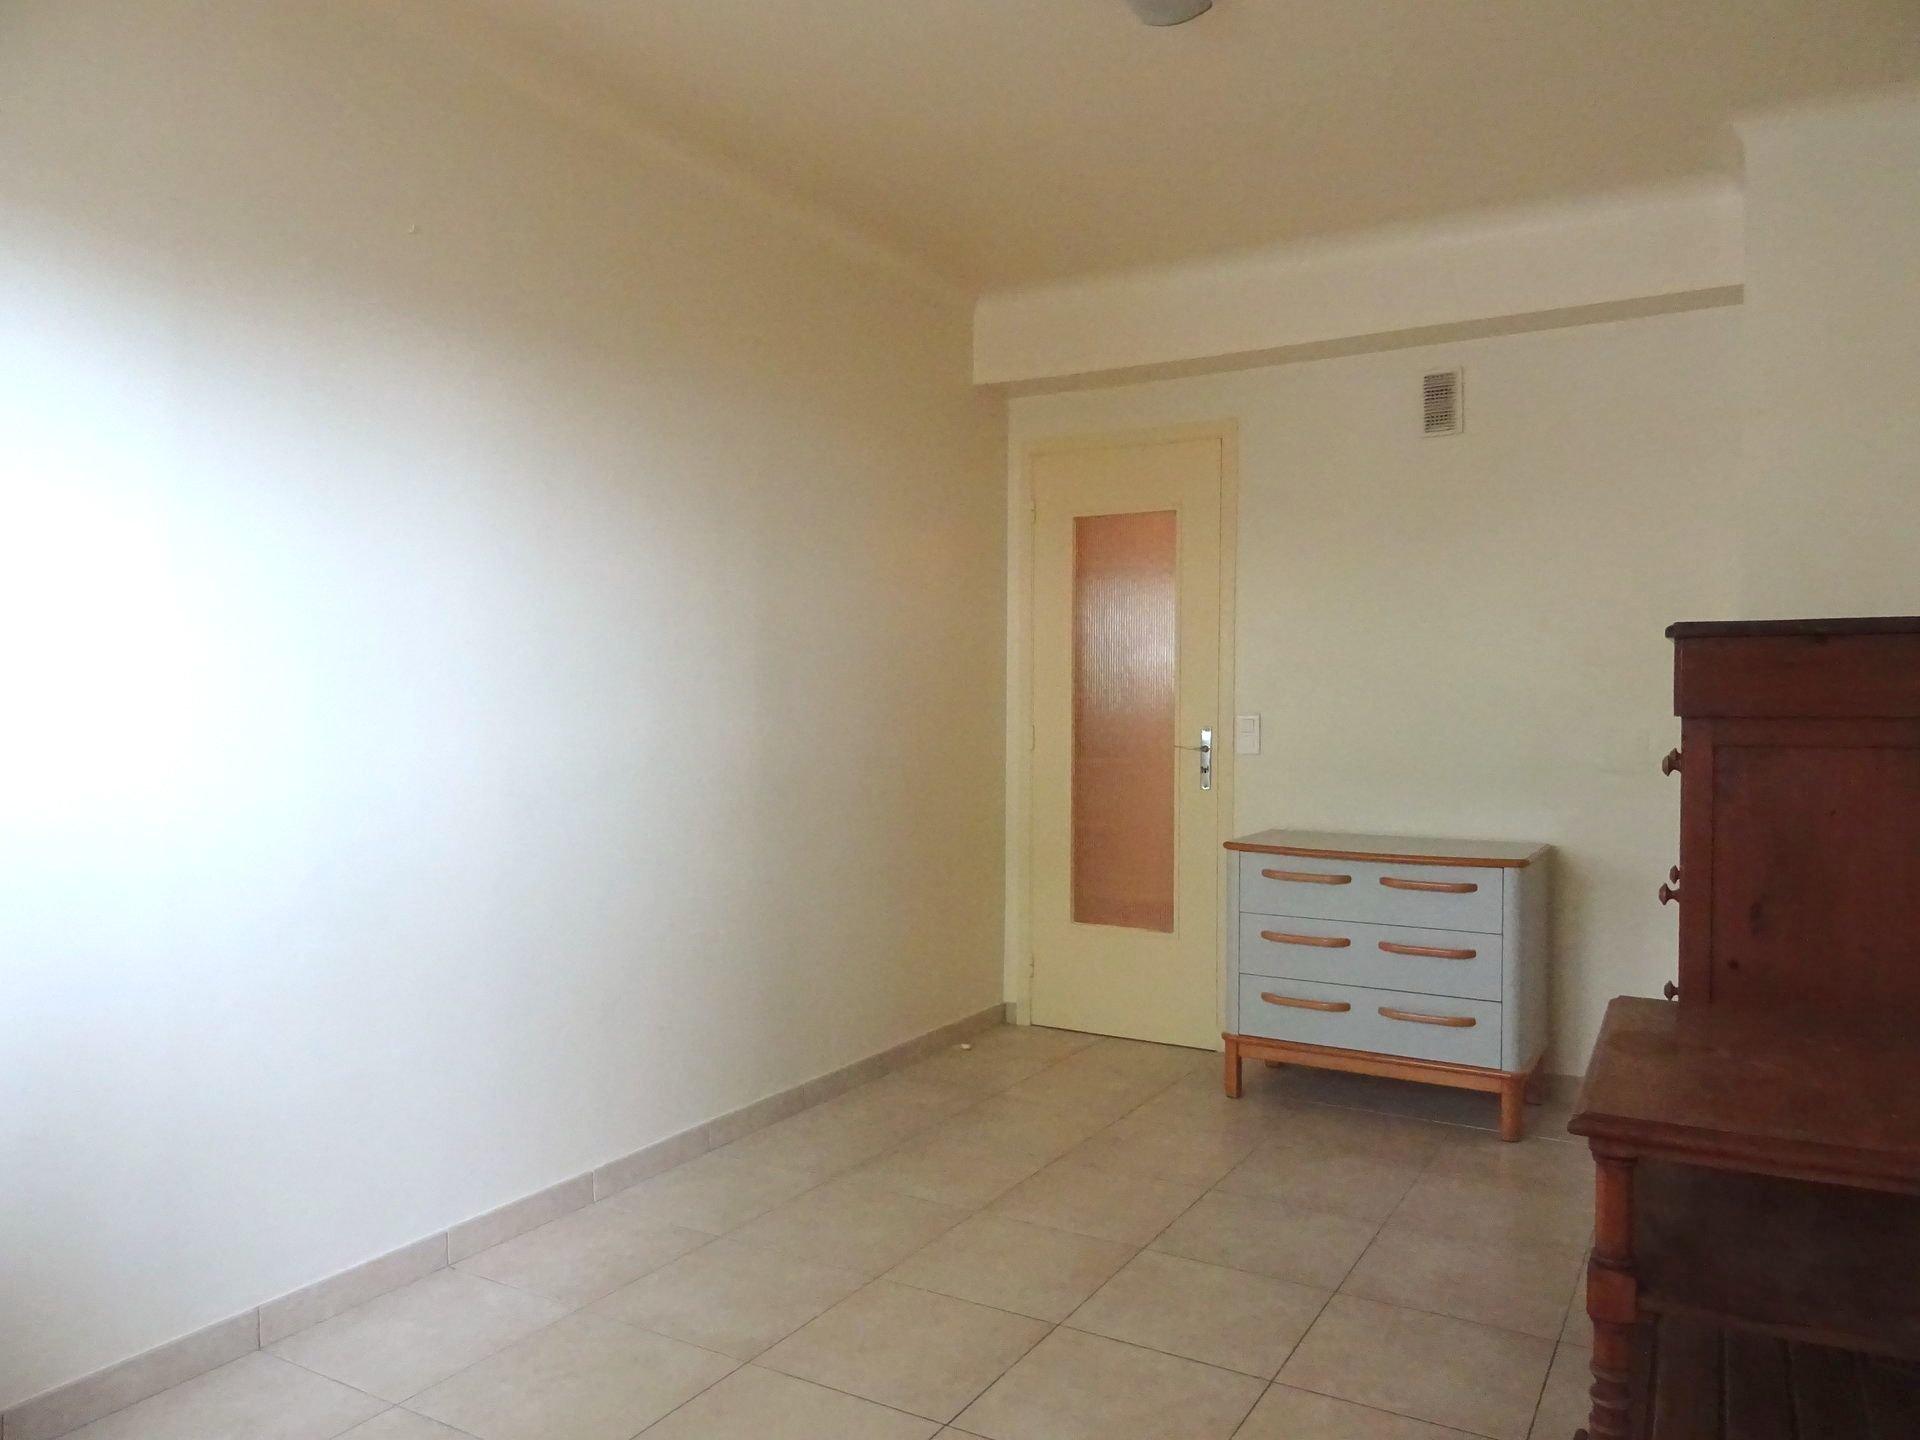 Vendita Appartamento - Mentone (Menton) Centre